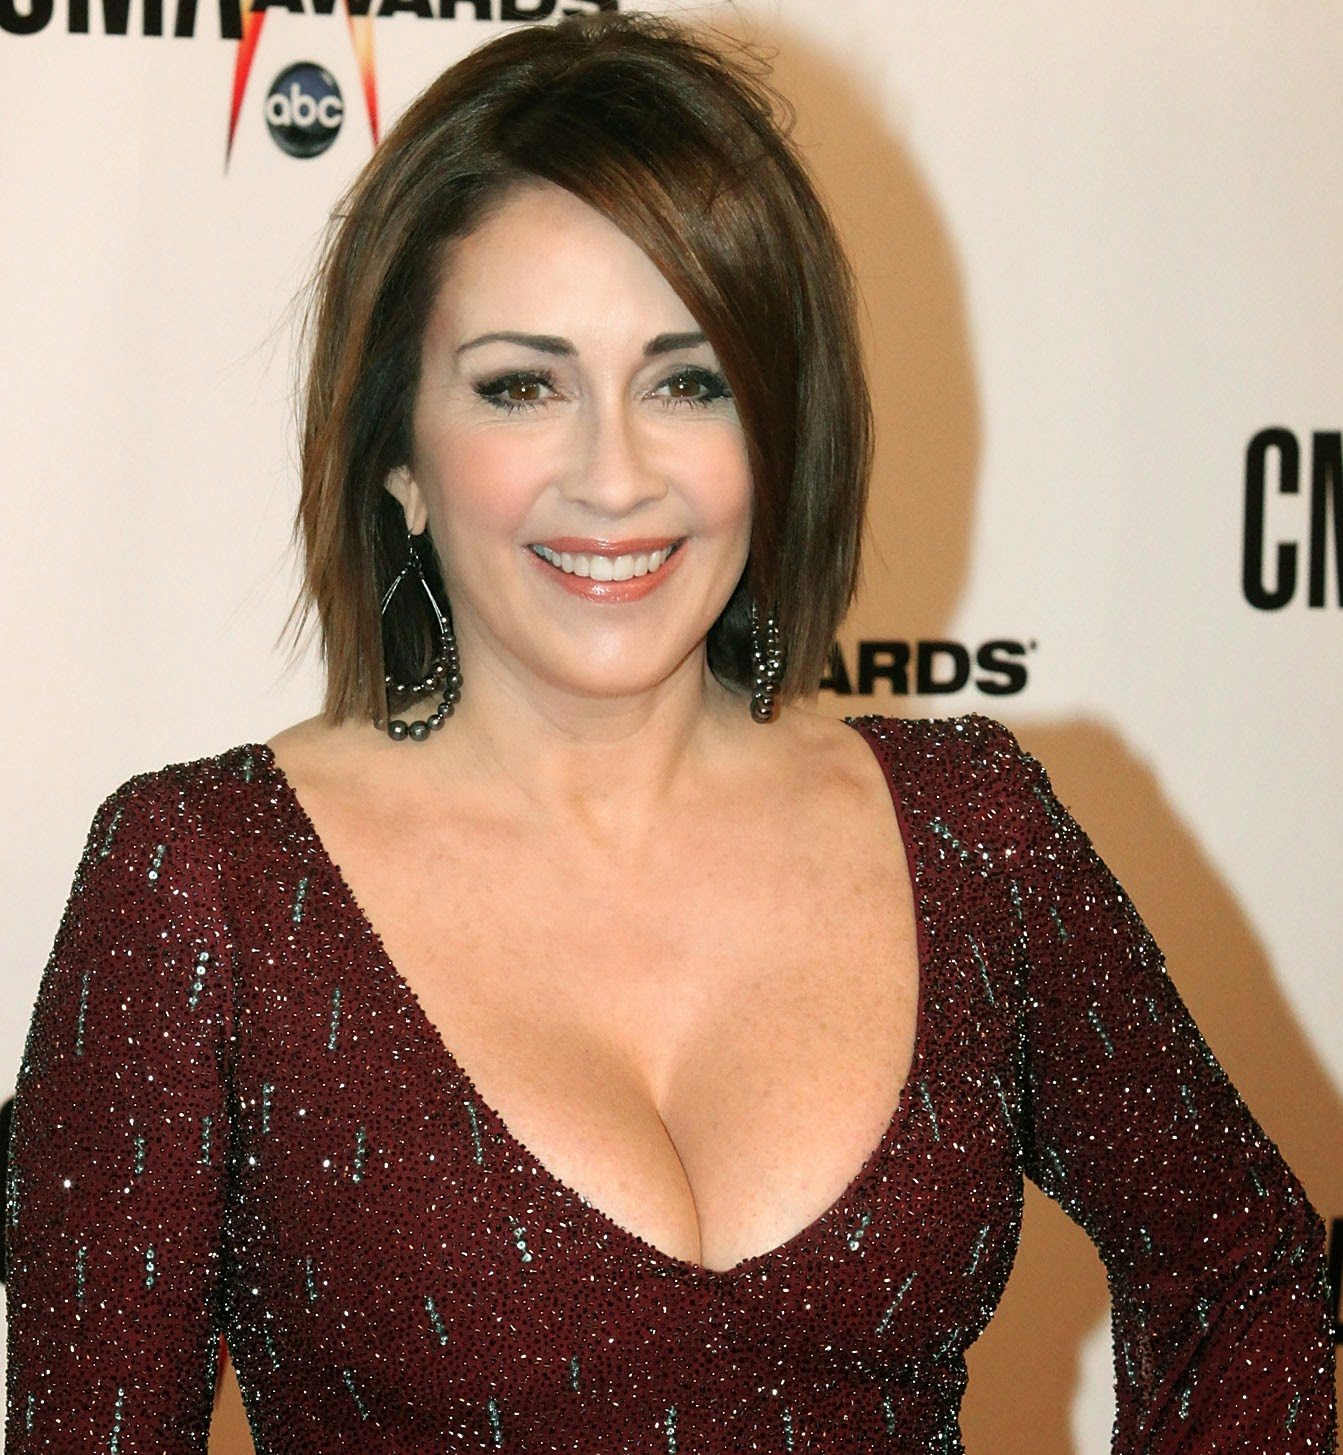 actress kendra wilkinson nude